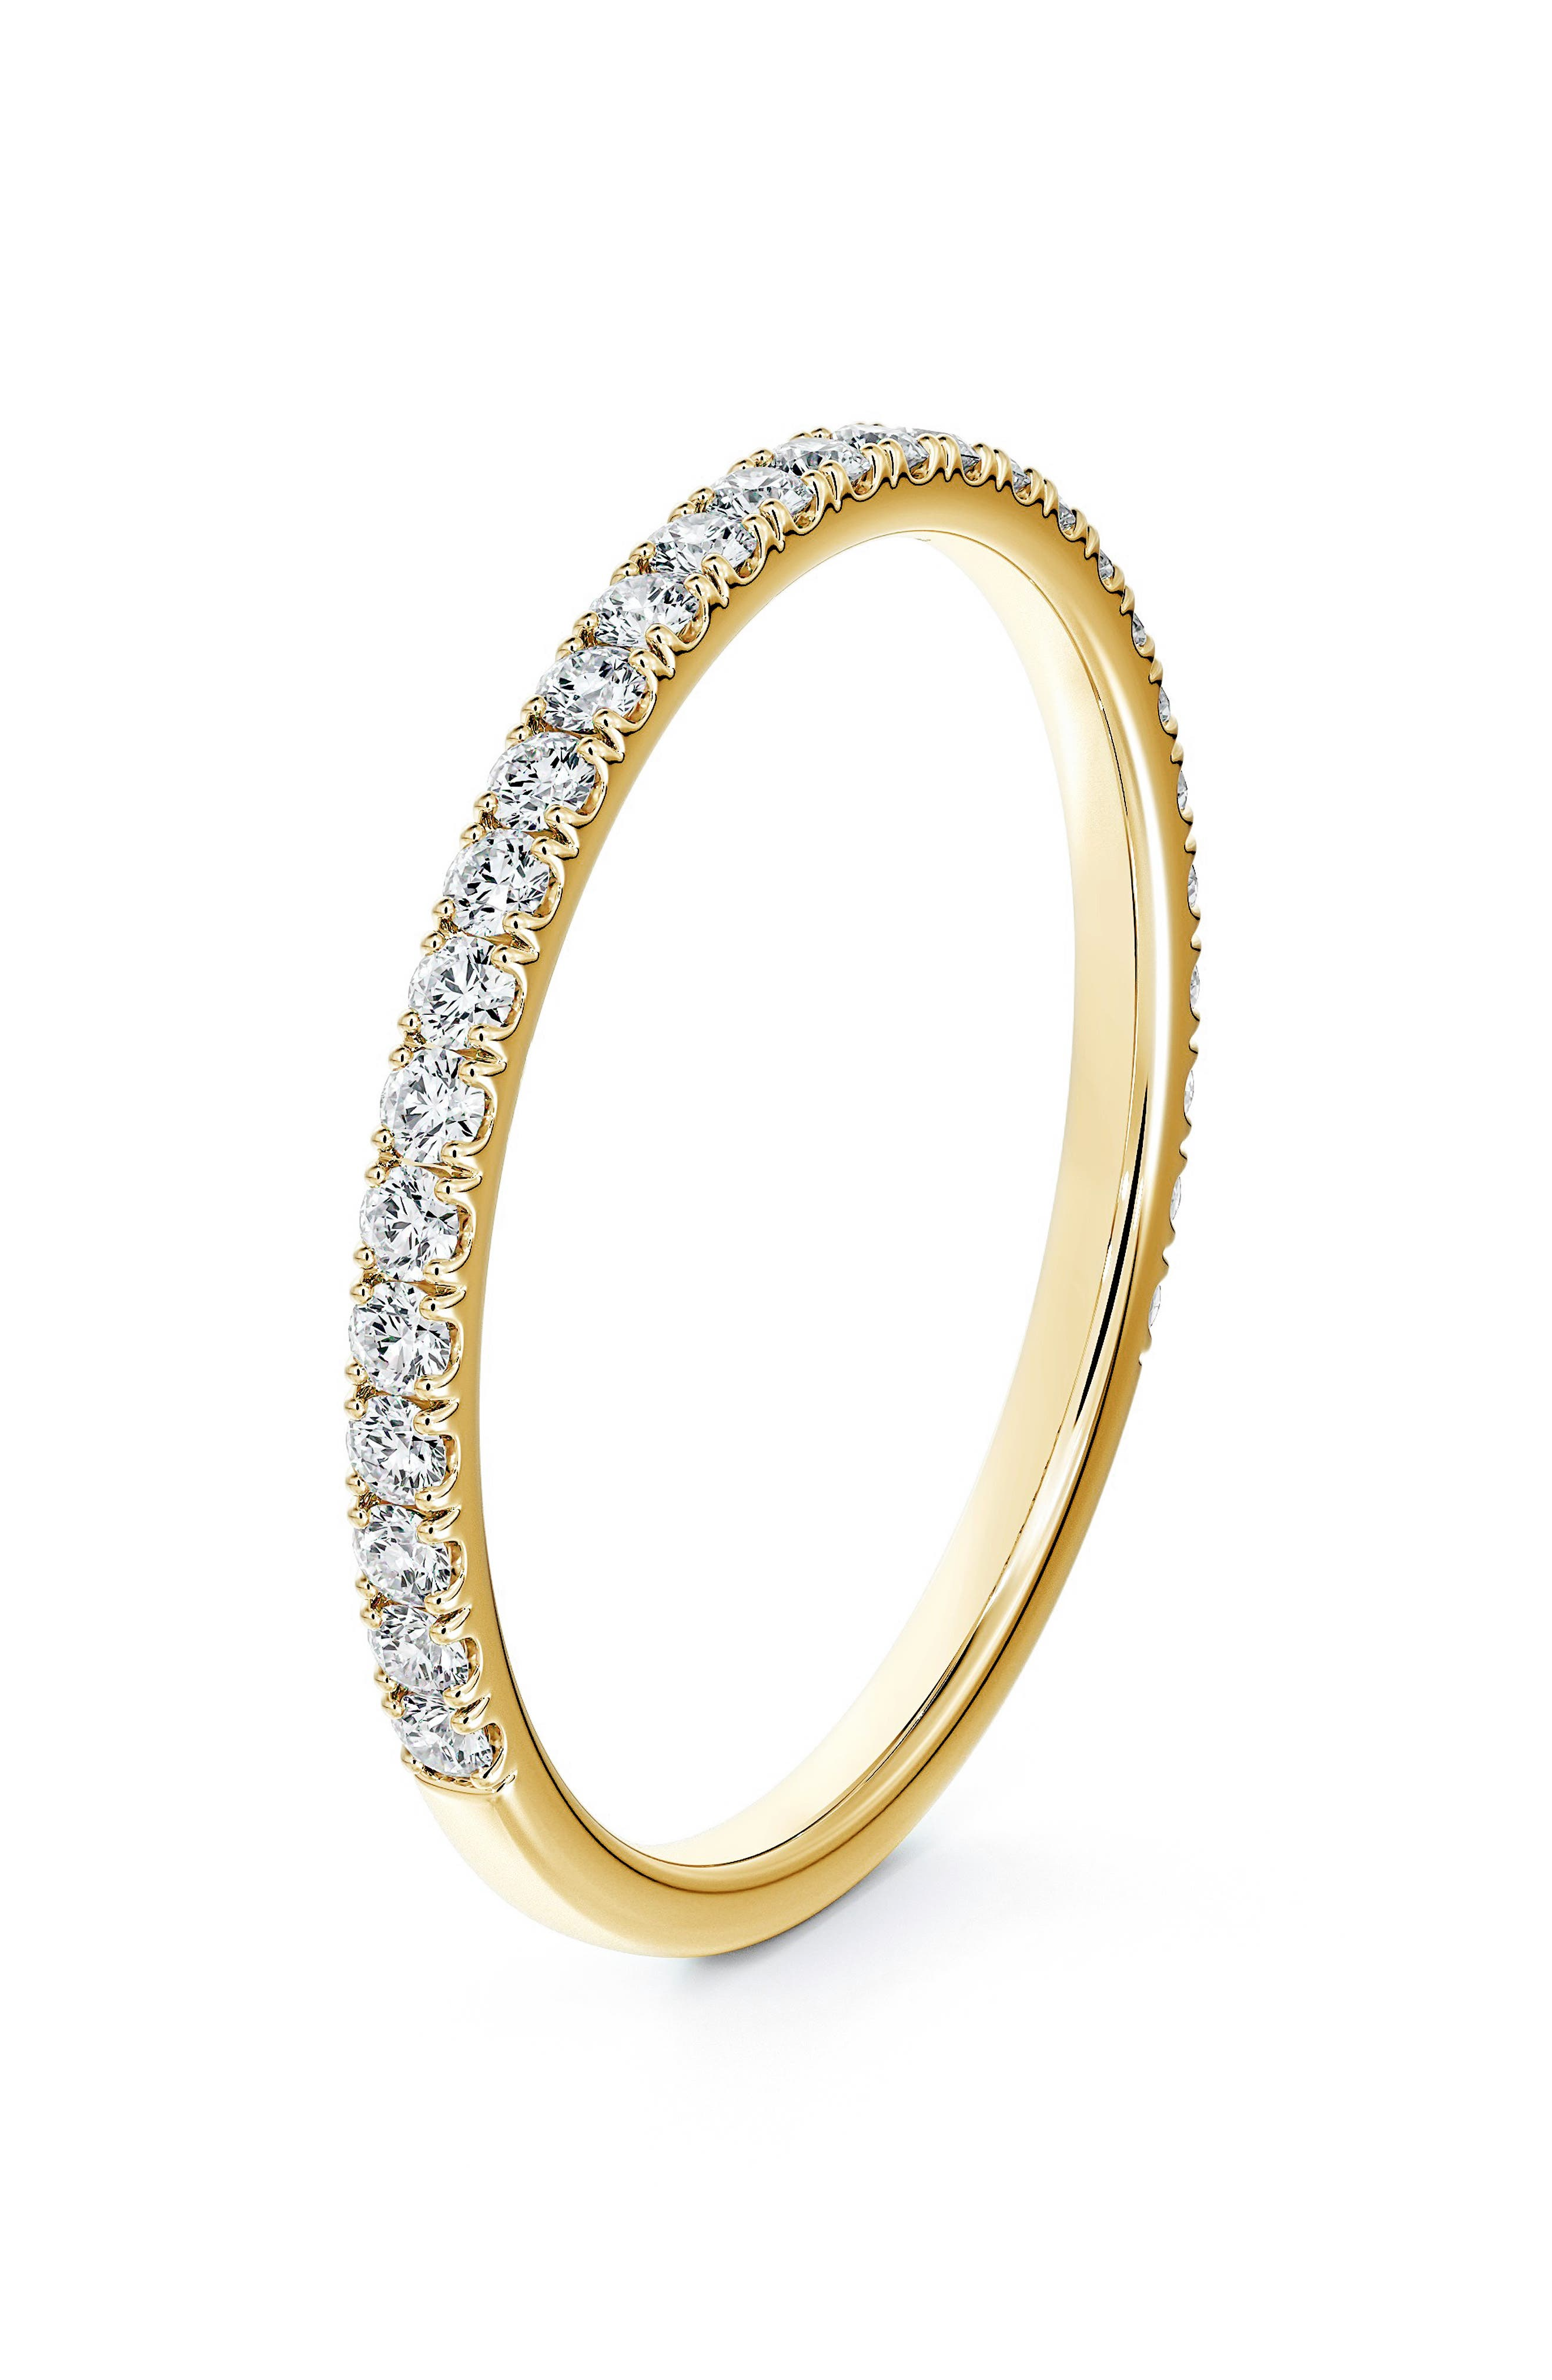 Engagement & Commitment Pave Diamond Band